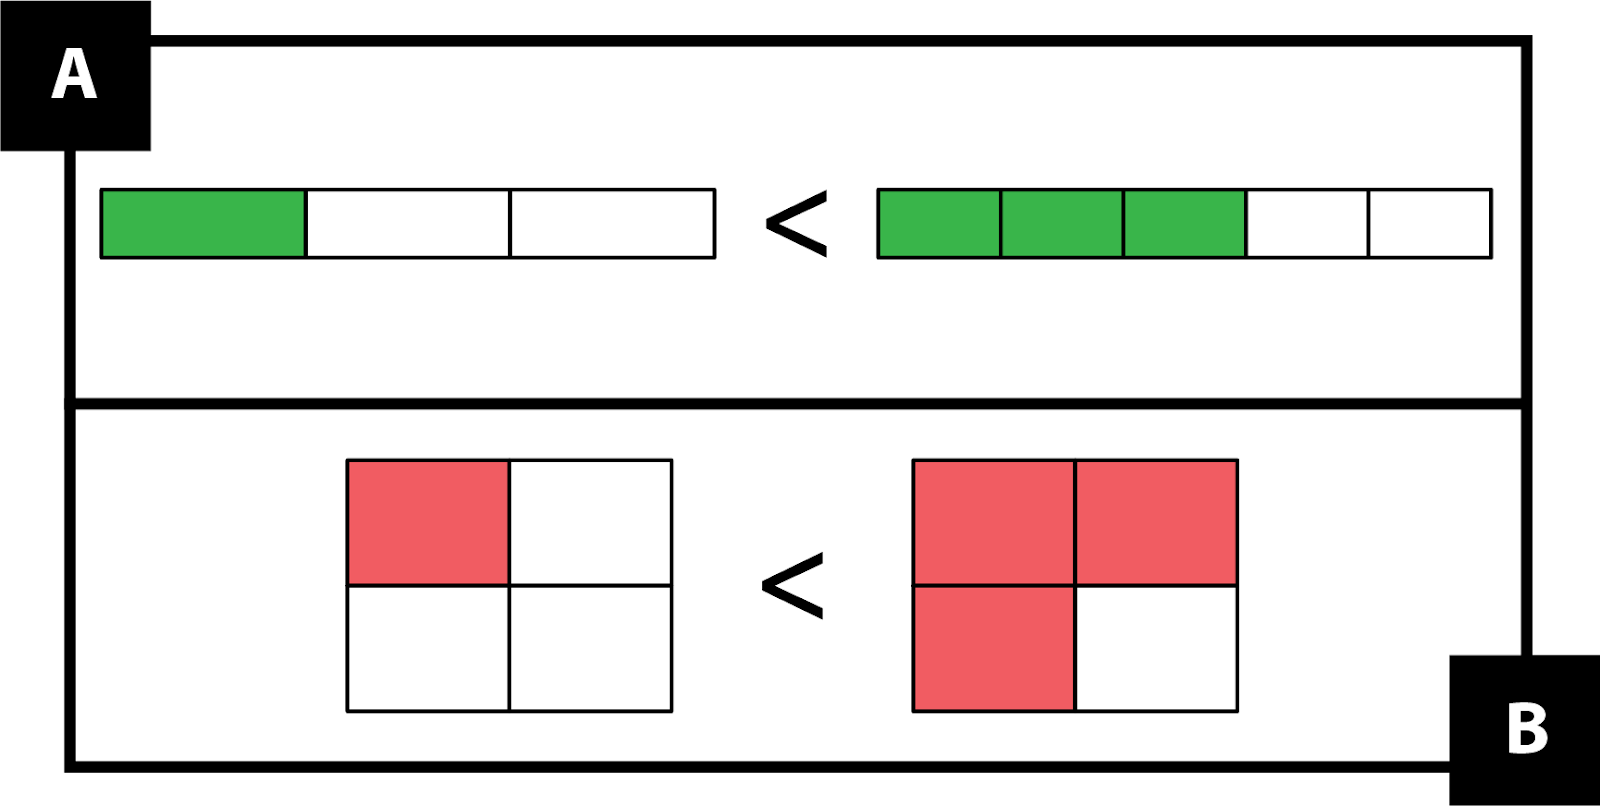 A: Bar models show 1-third is less than 3-fifths. B: Area models show that 1-fourth is less than 3-fourths.